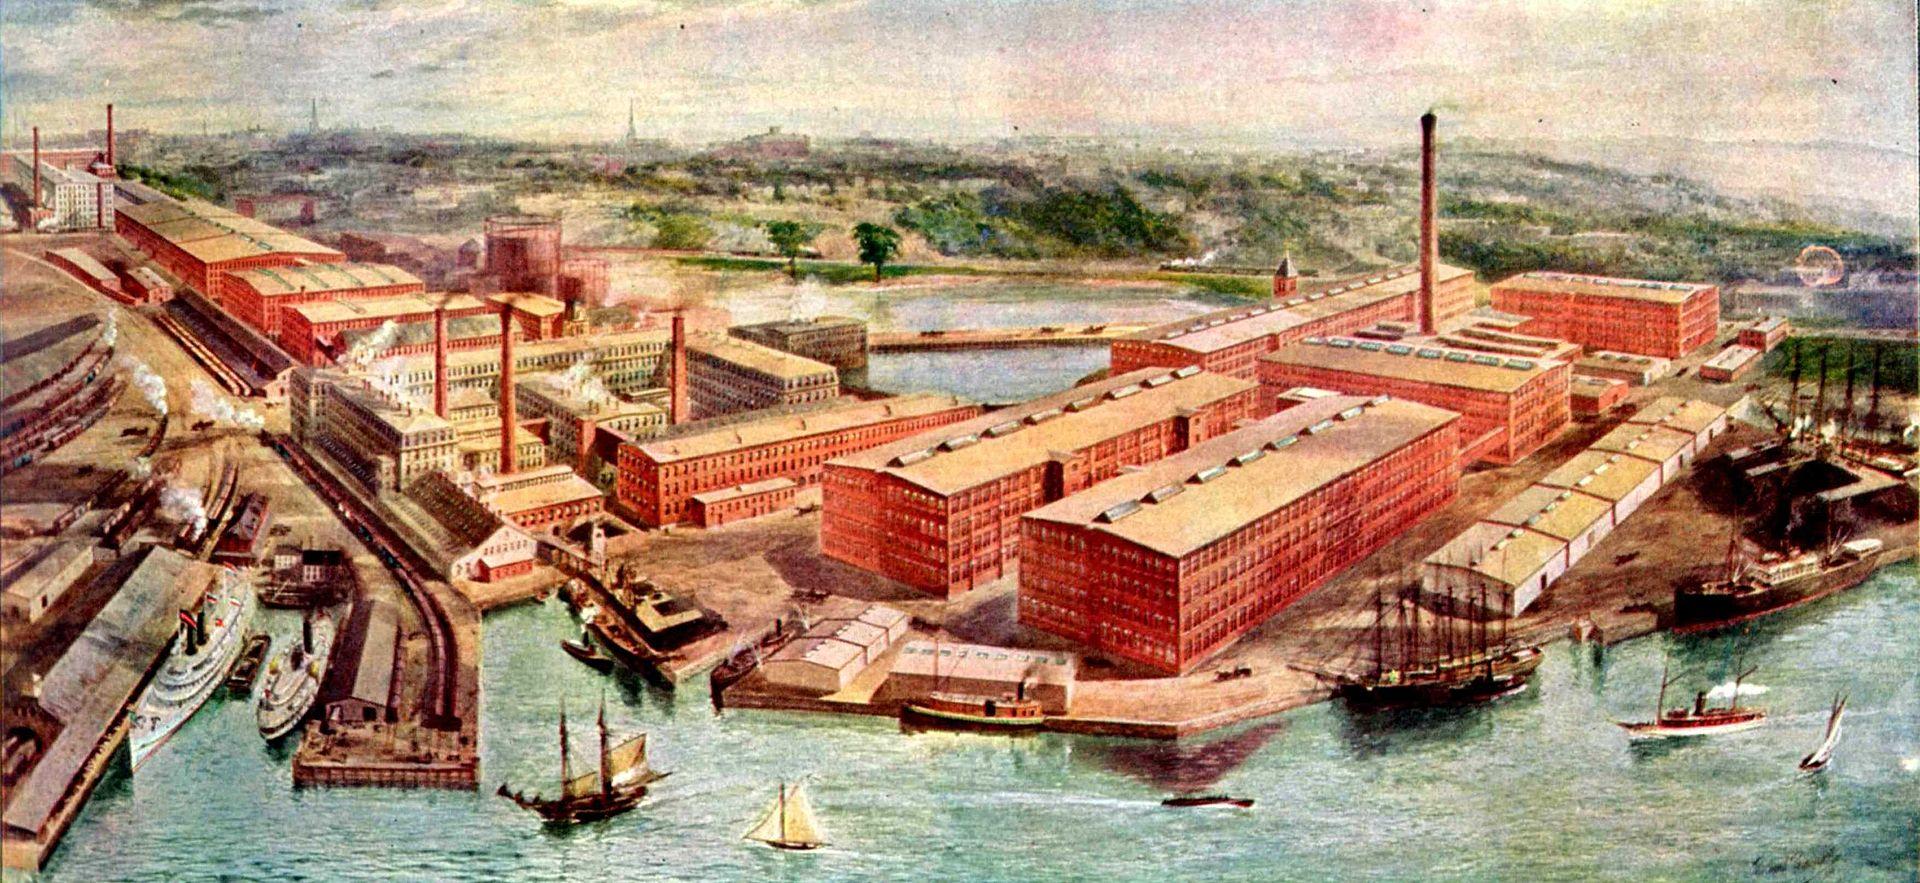 American Printing Company 1910 Illustration